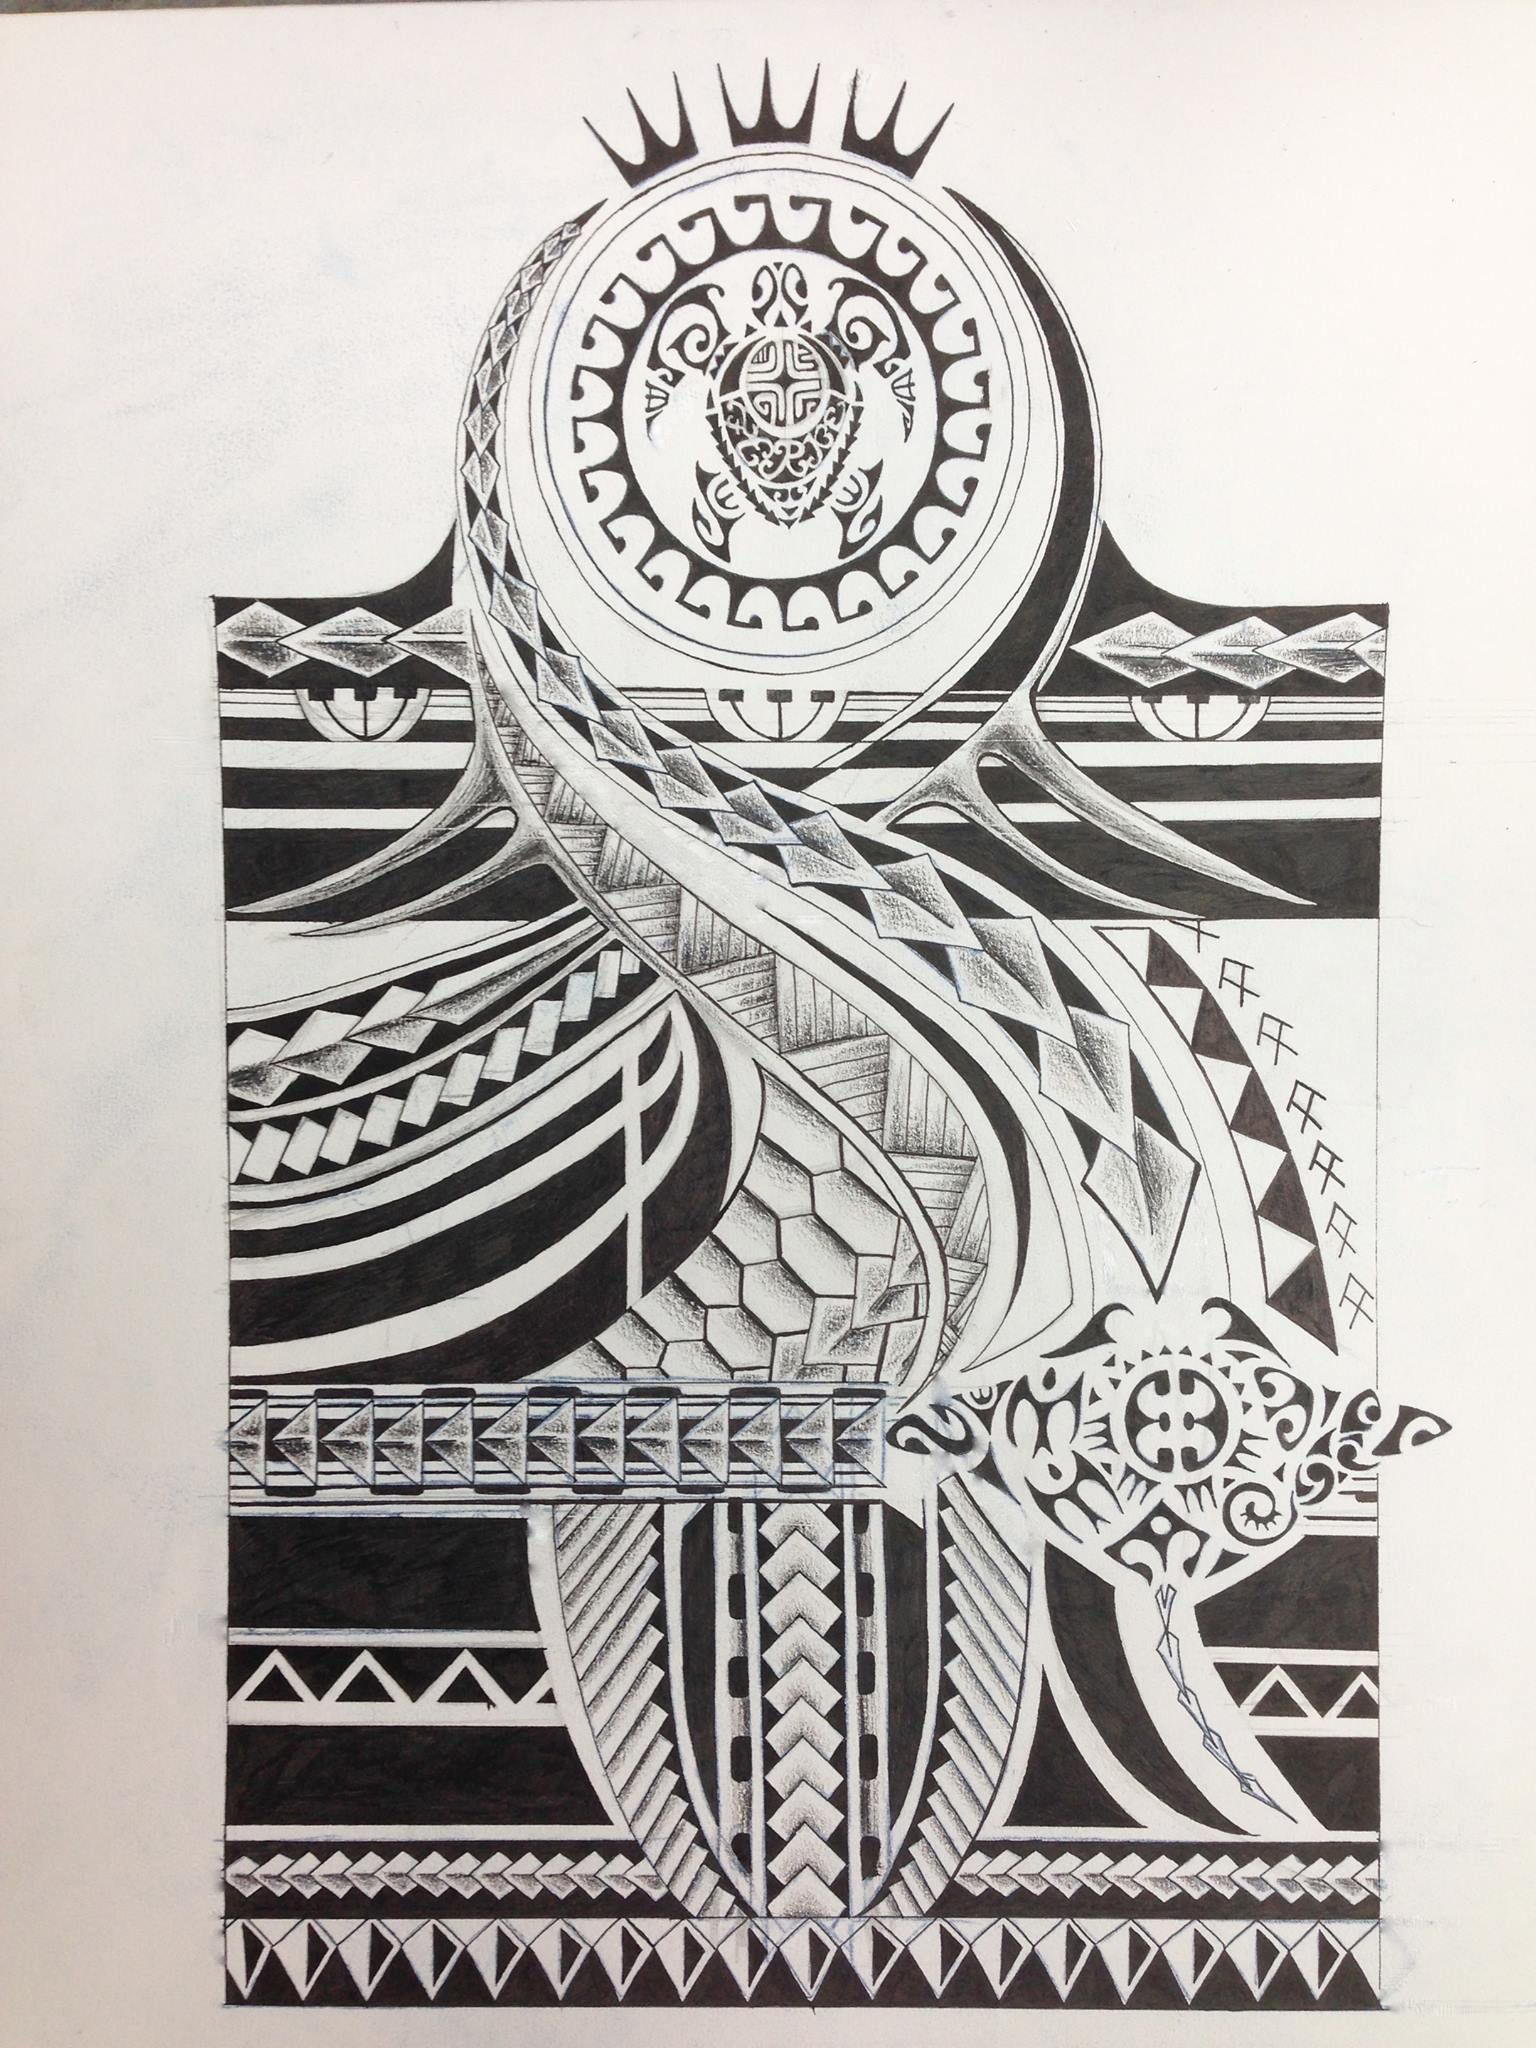 Maori Band Tattoo Design: Pin By Ravindu Shanaka On Maori Tattoos